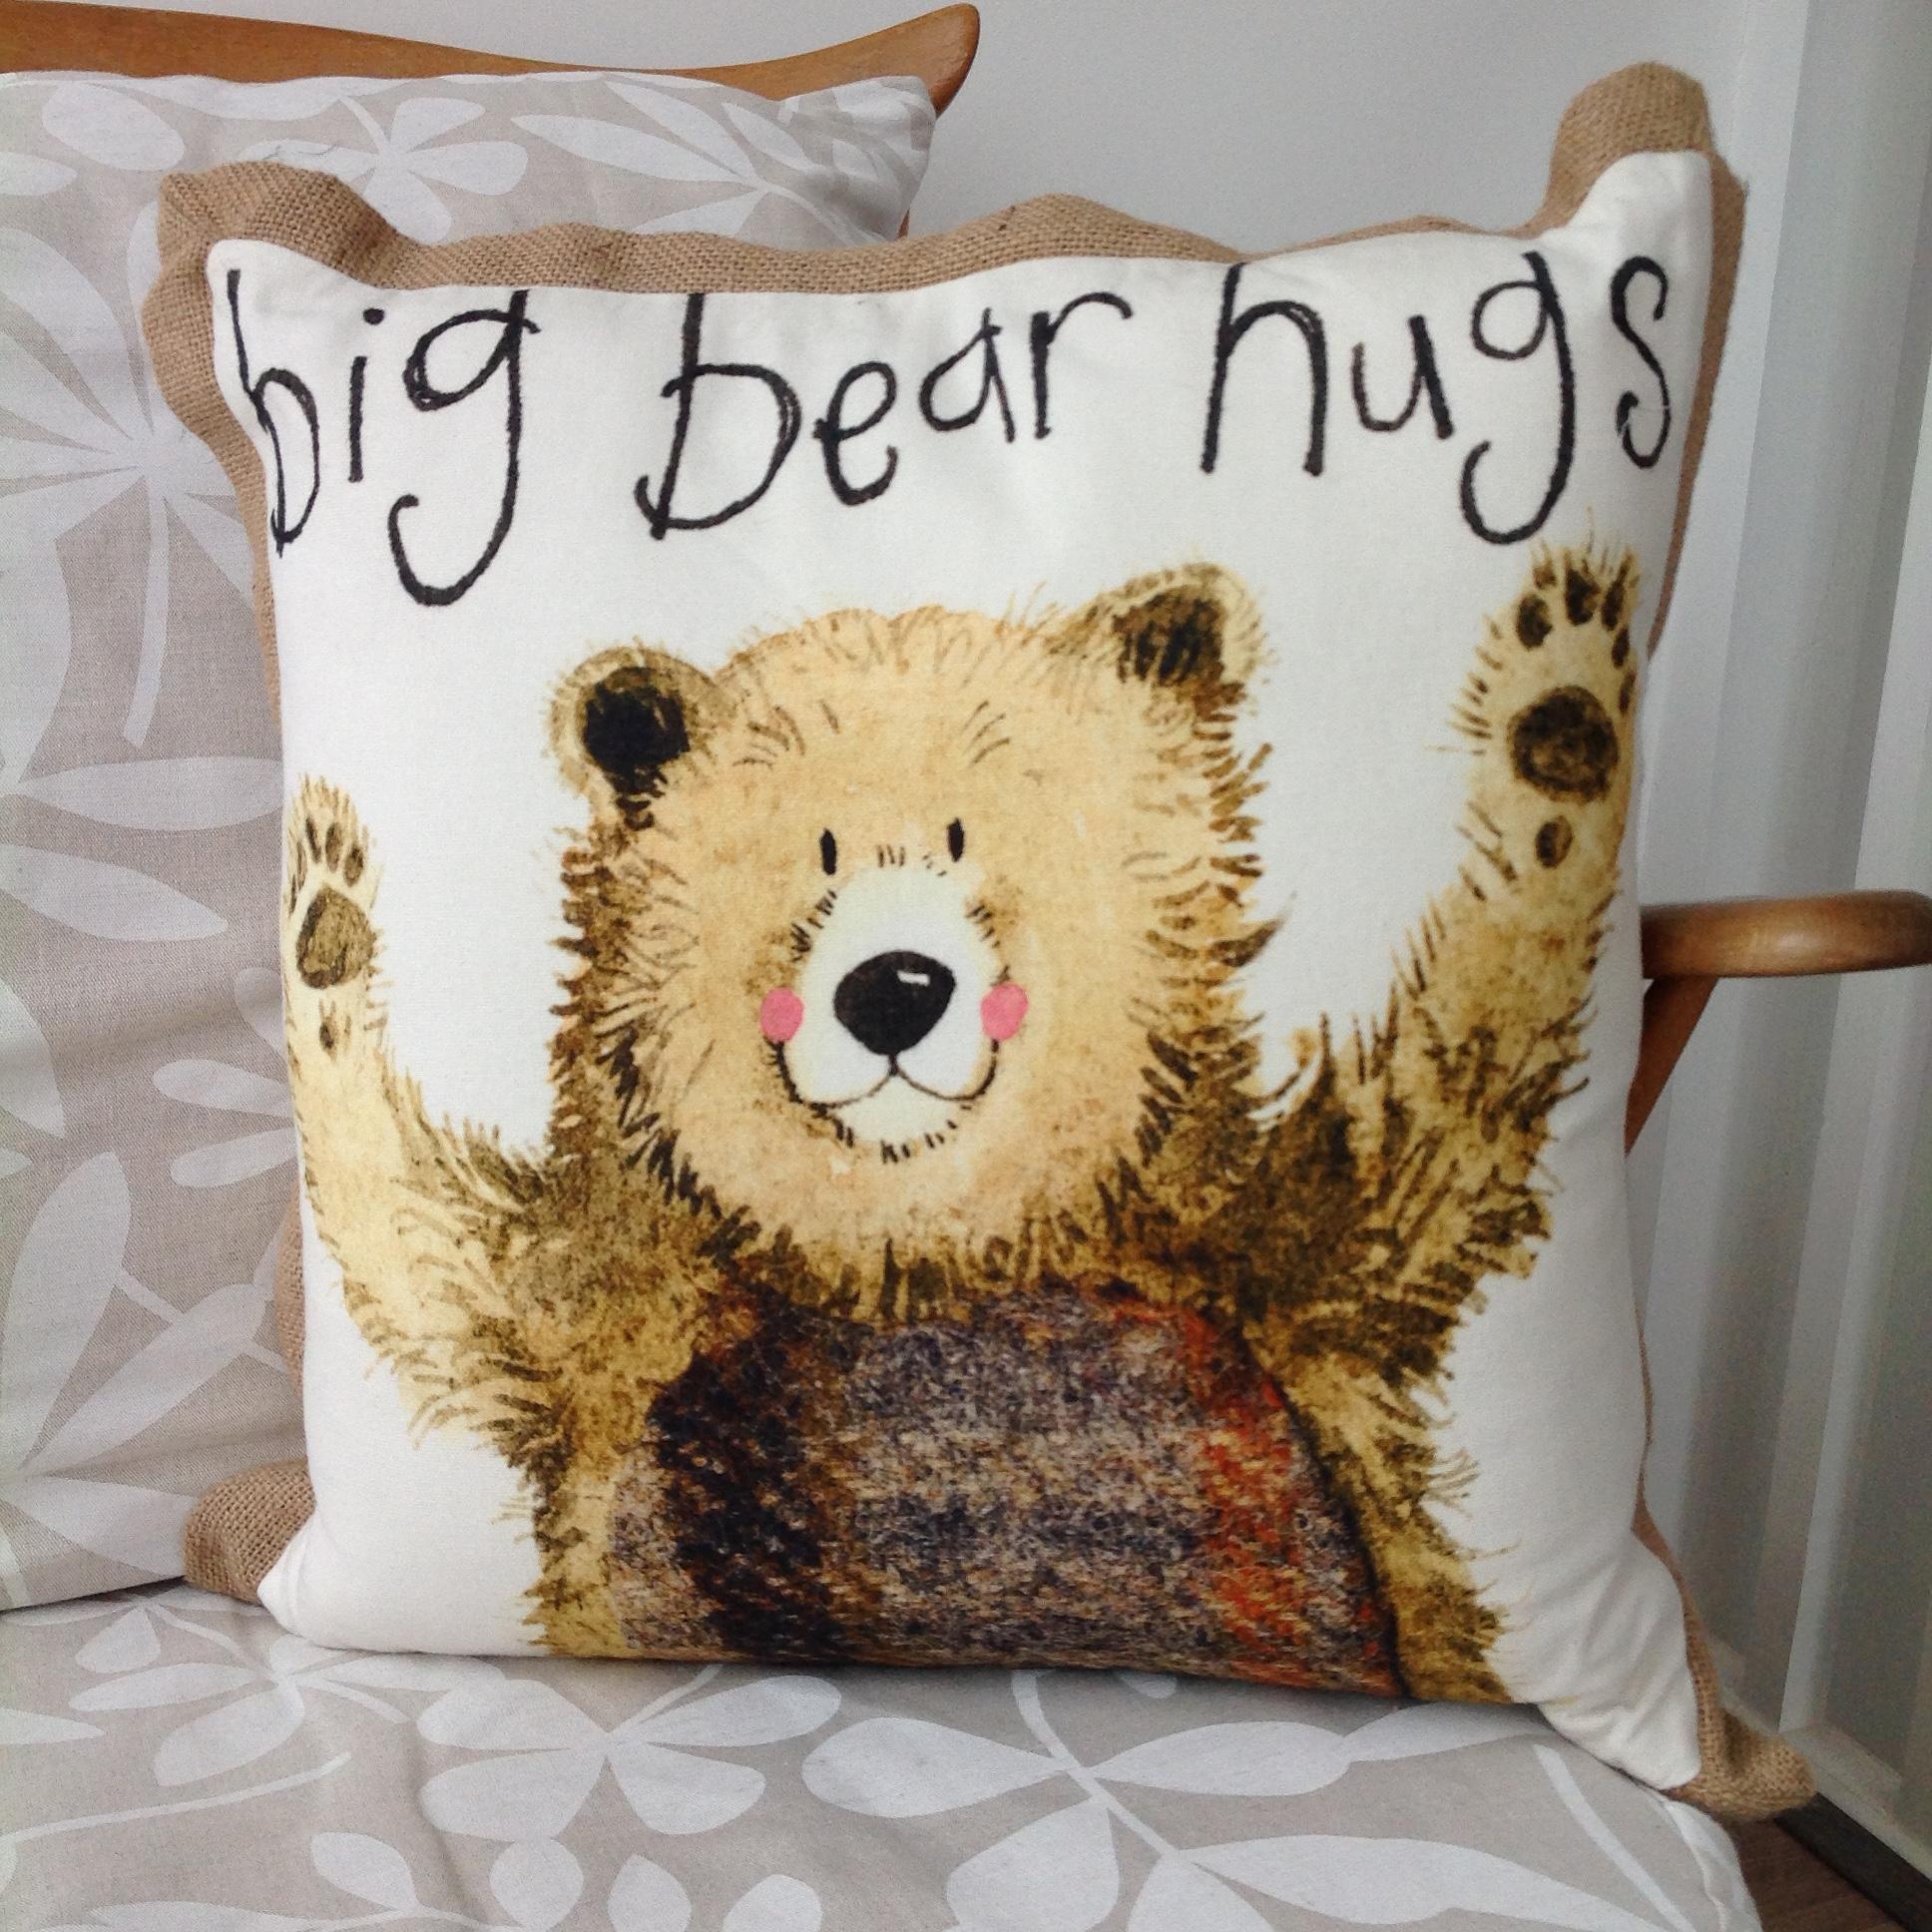 catalog/products/cushions/big-bear-hugs-cushion.JPG